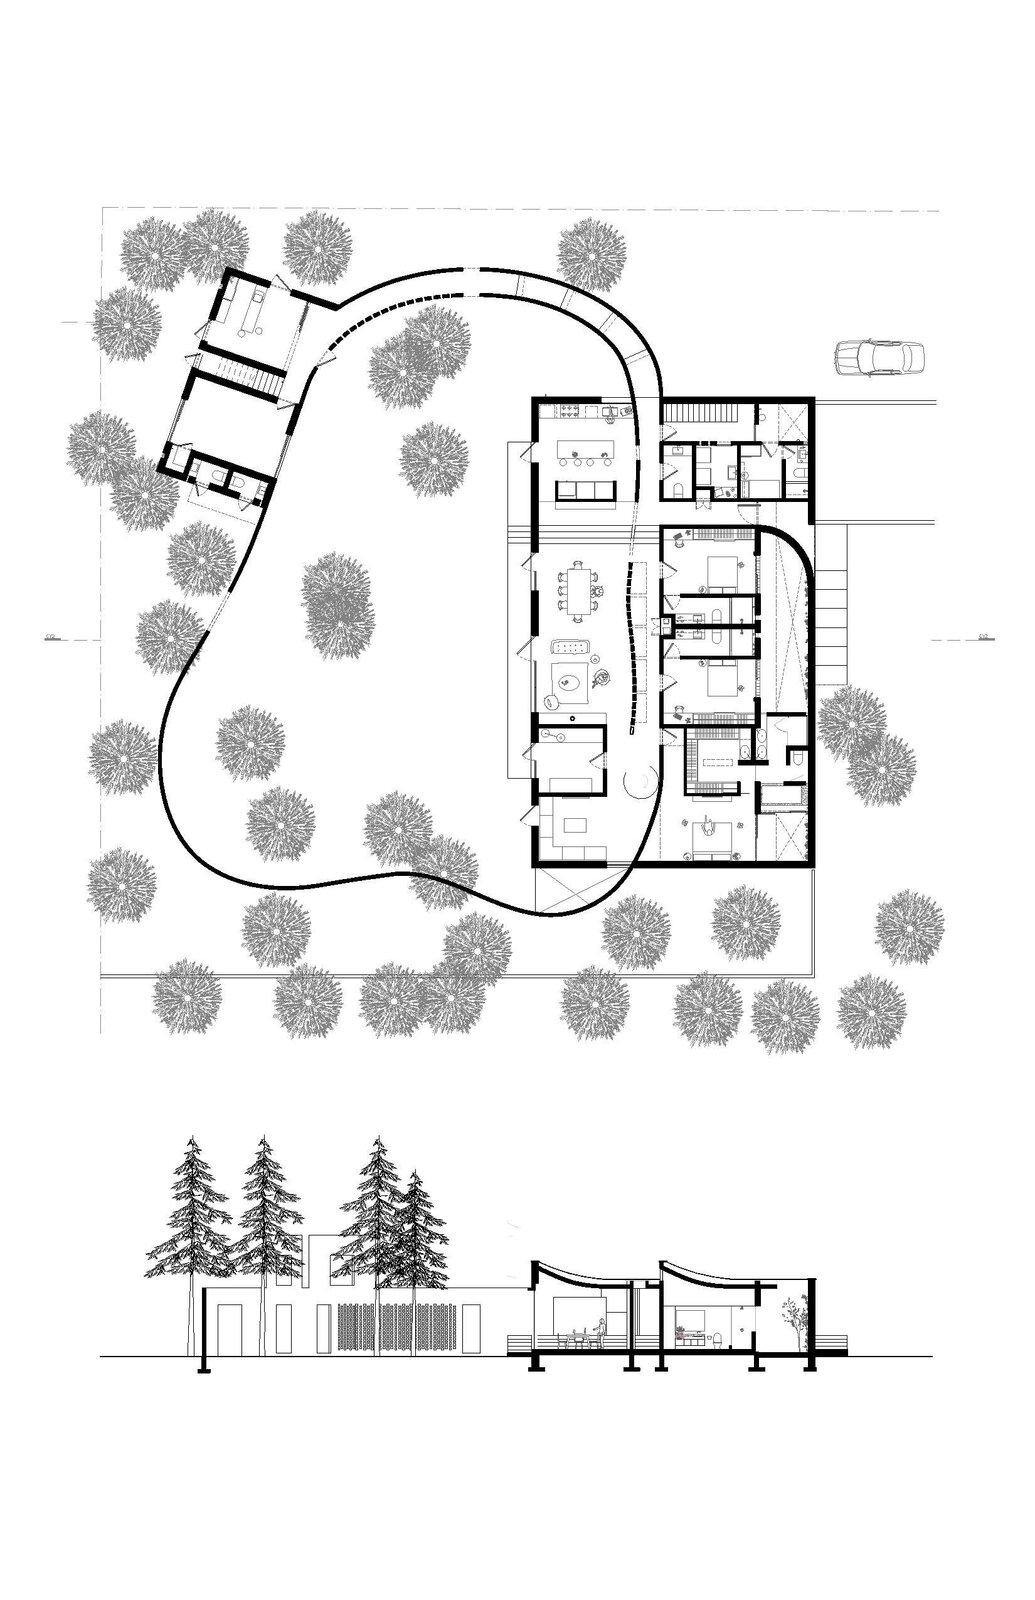 Forest House floor plan